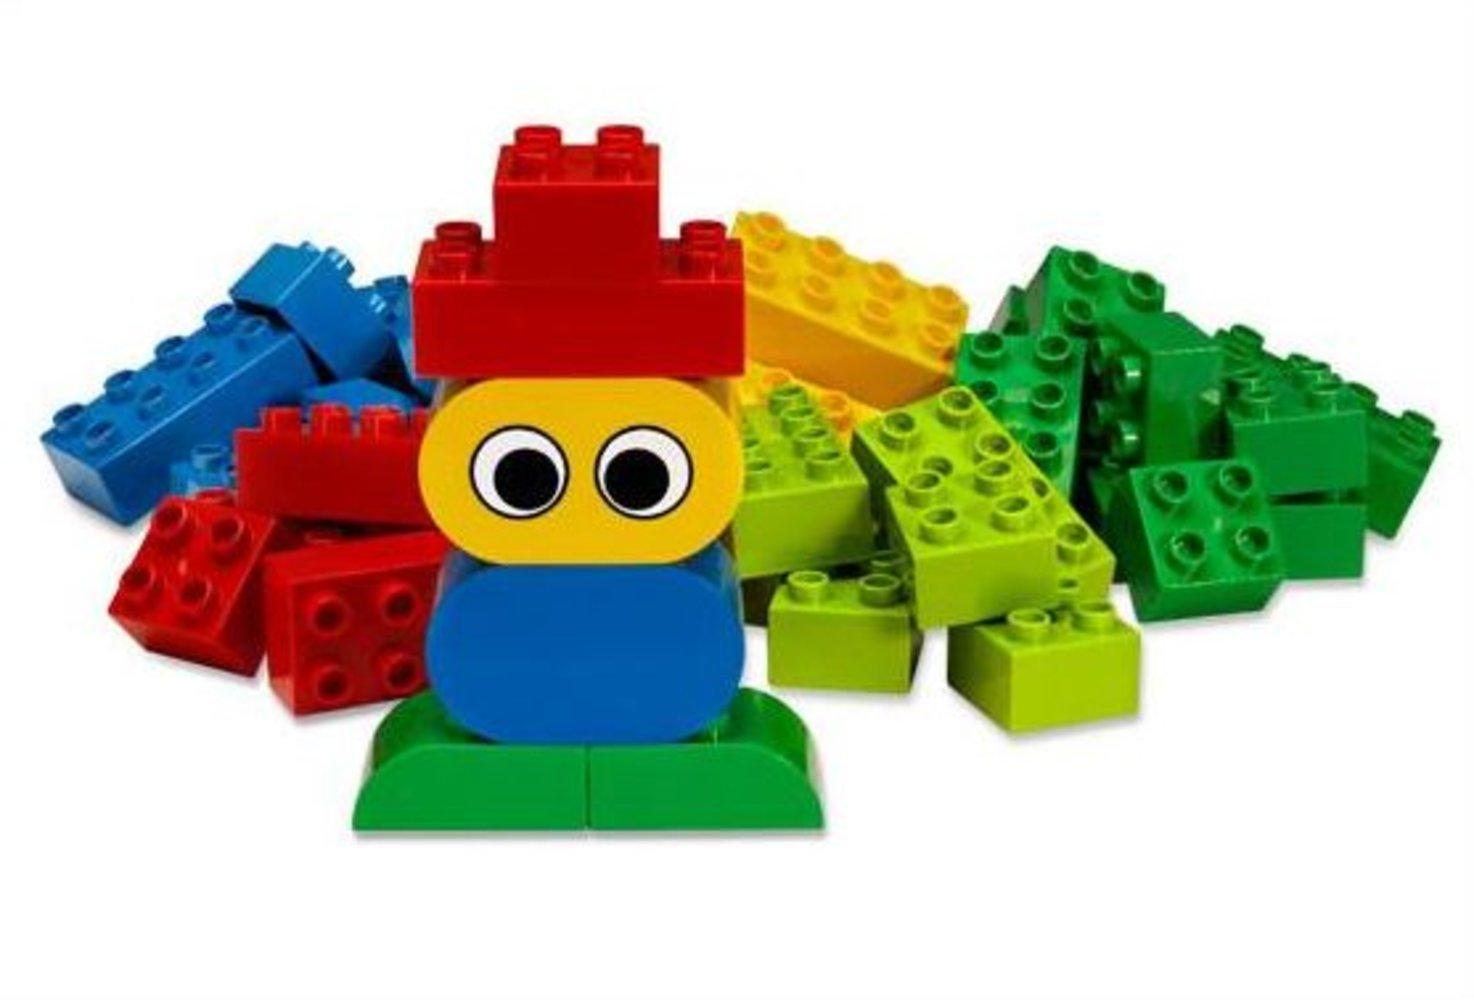 Basic Bricks with Fun Figures